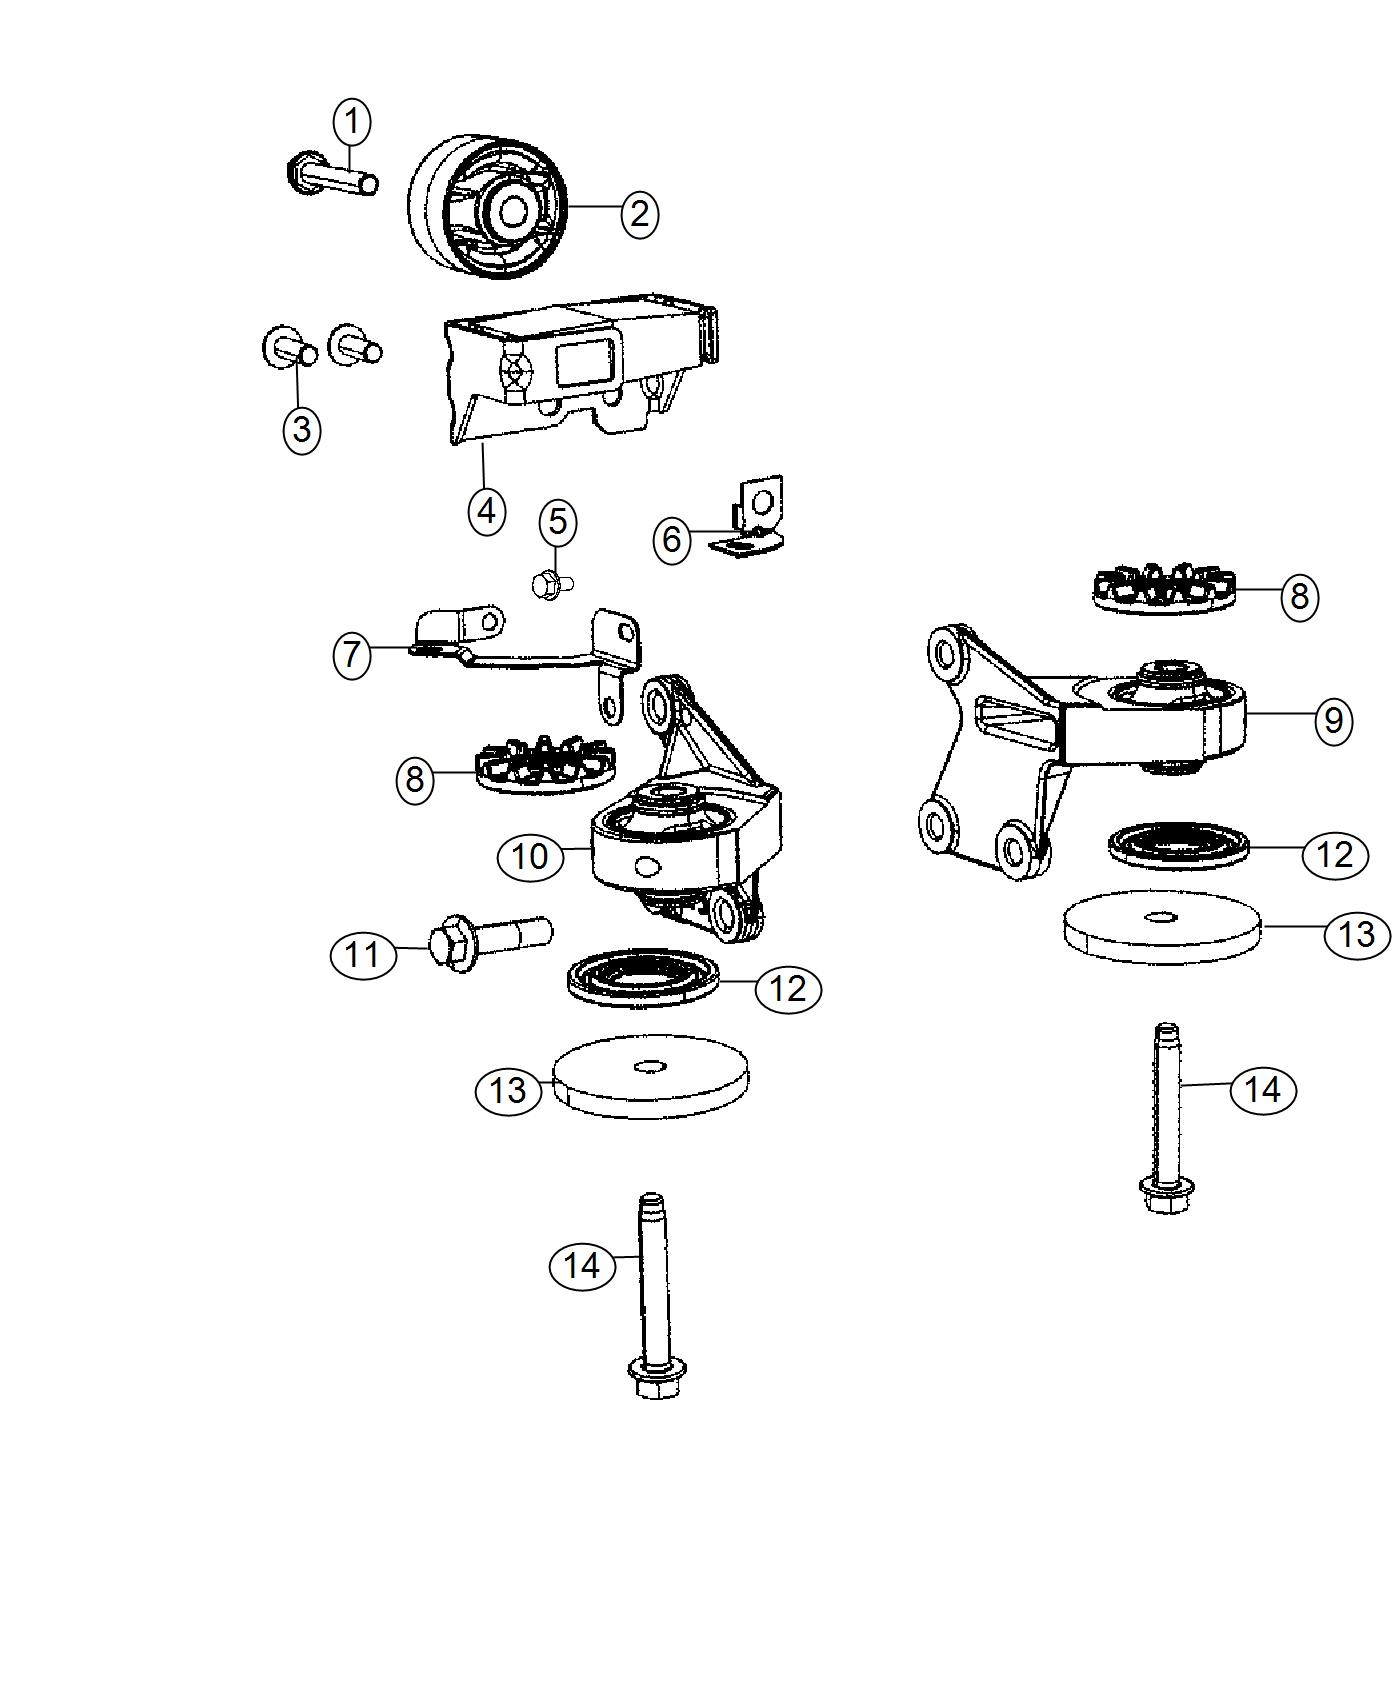 Jeep Compass Bolt Hex Flange Head M6x1 00x12 00